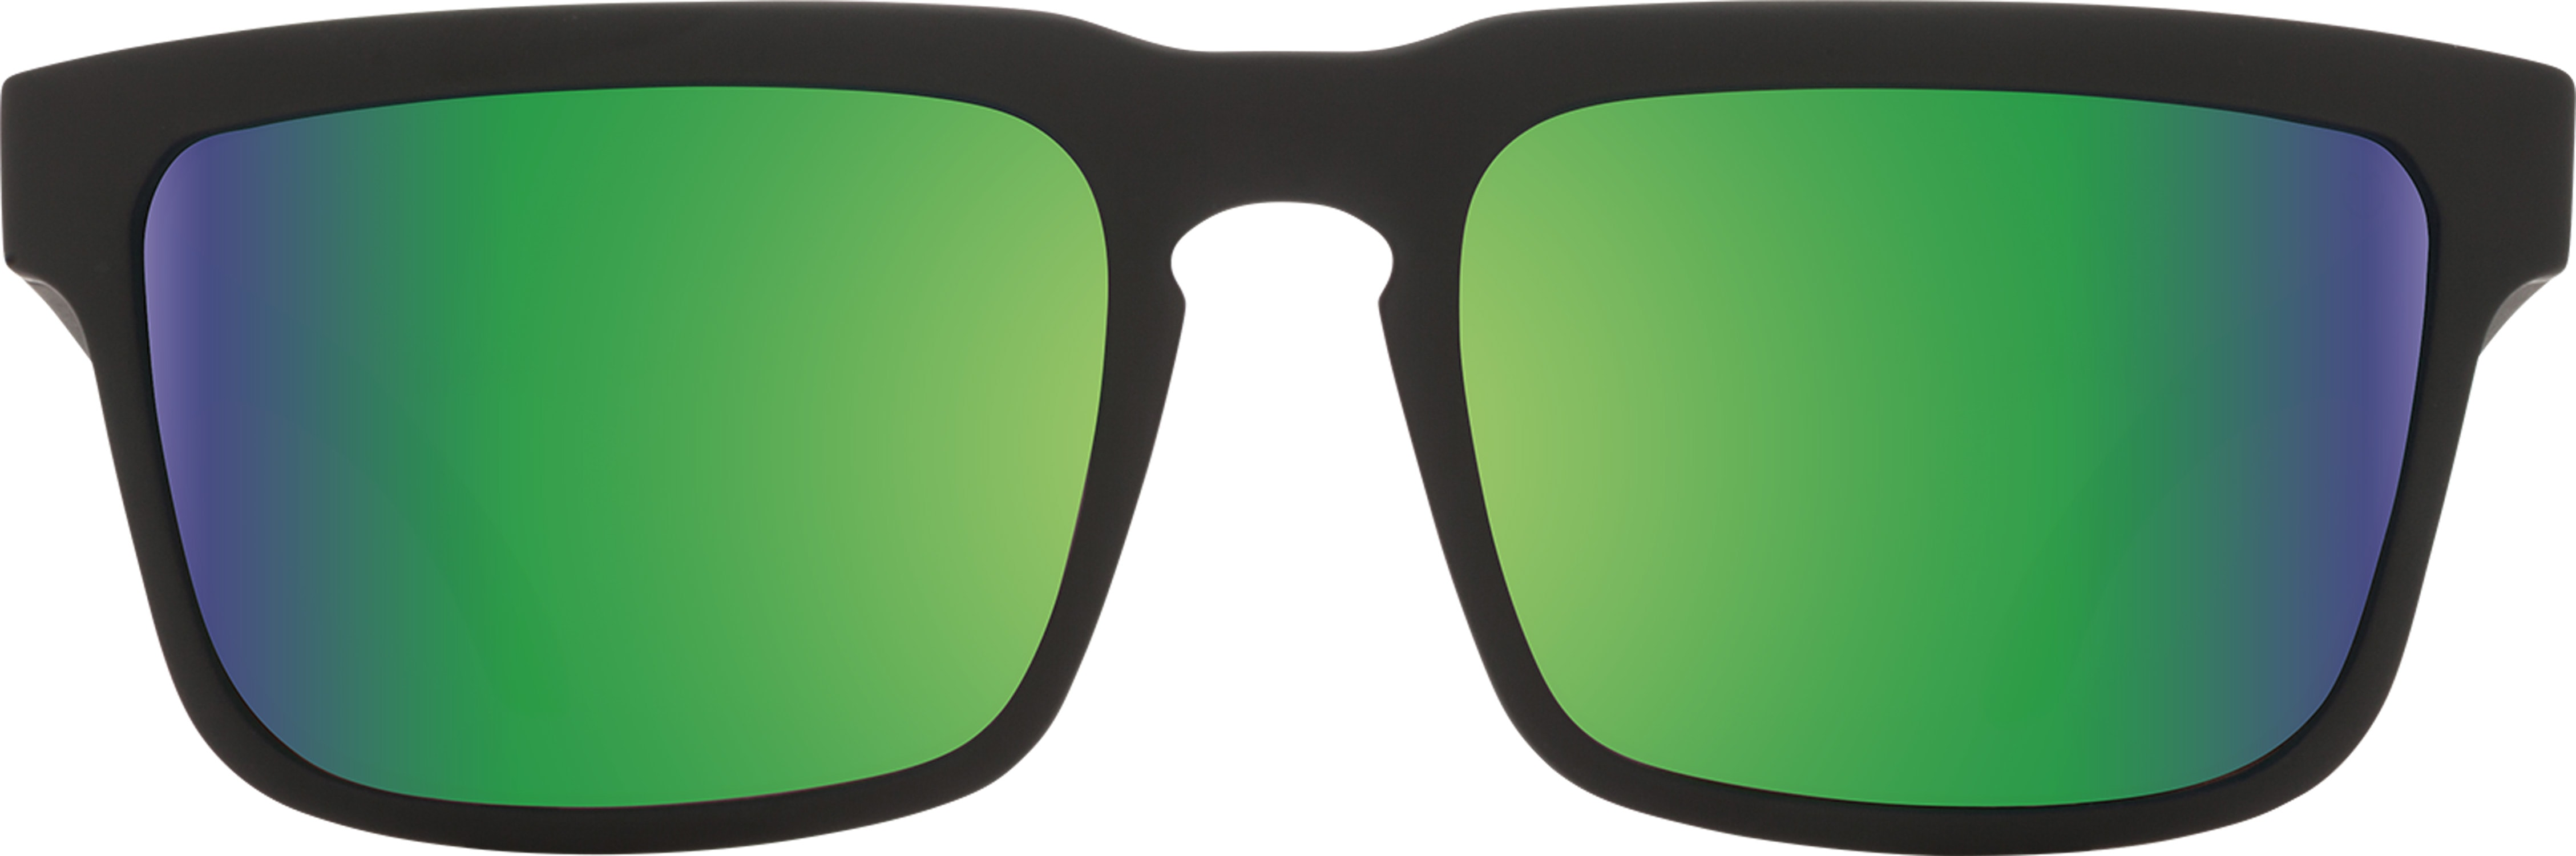 c2f622d7a0e Spy Helm Sunglasses - thumbnail 2